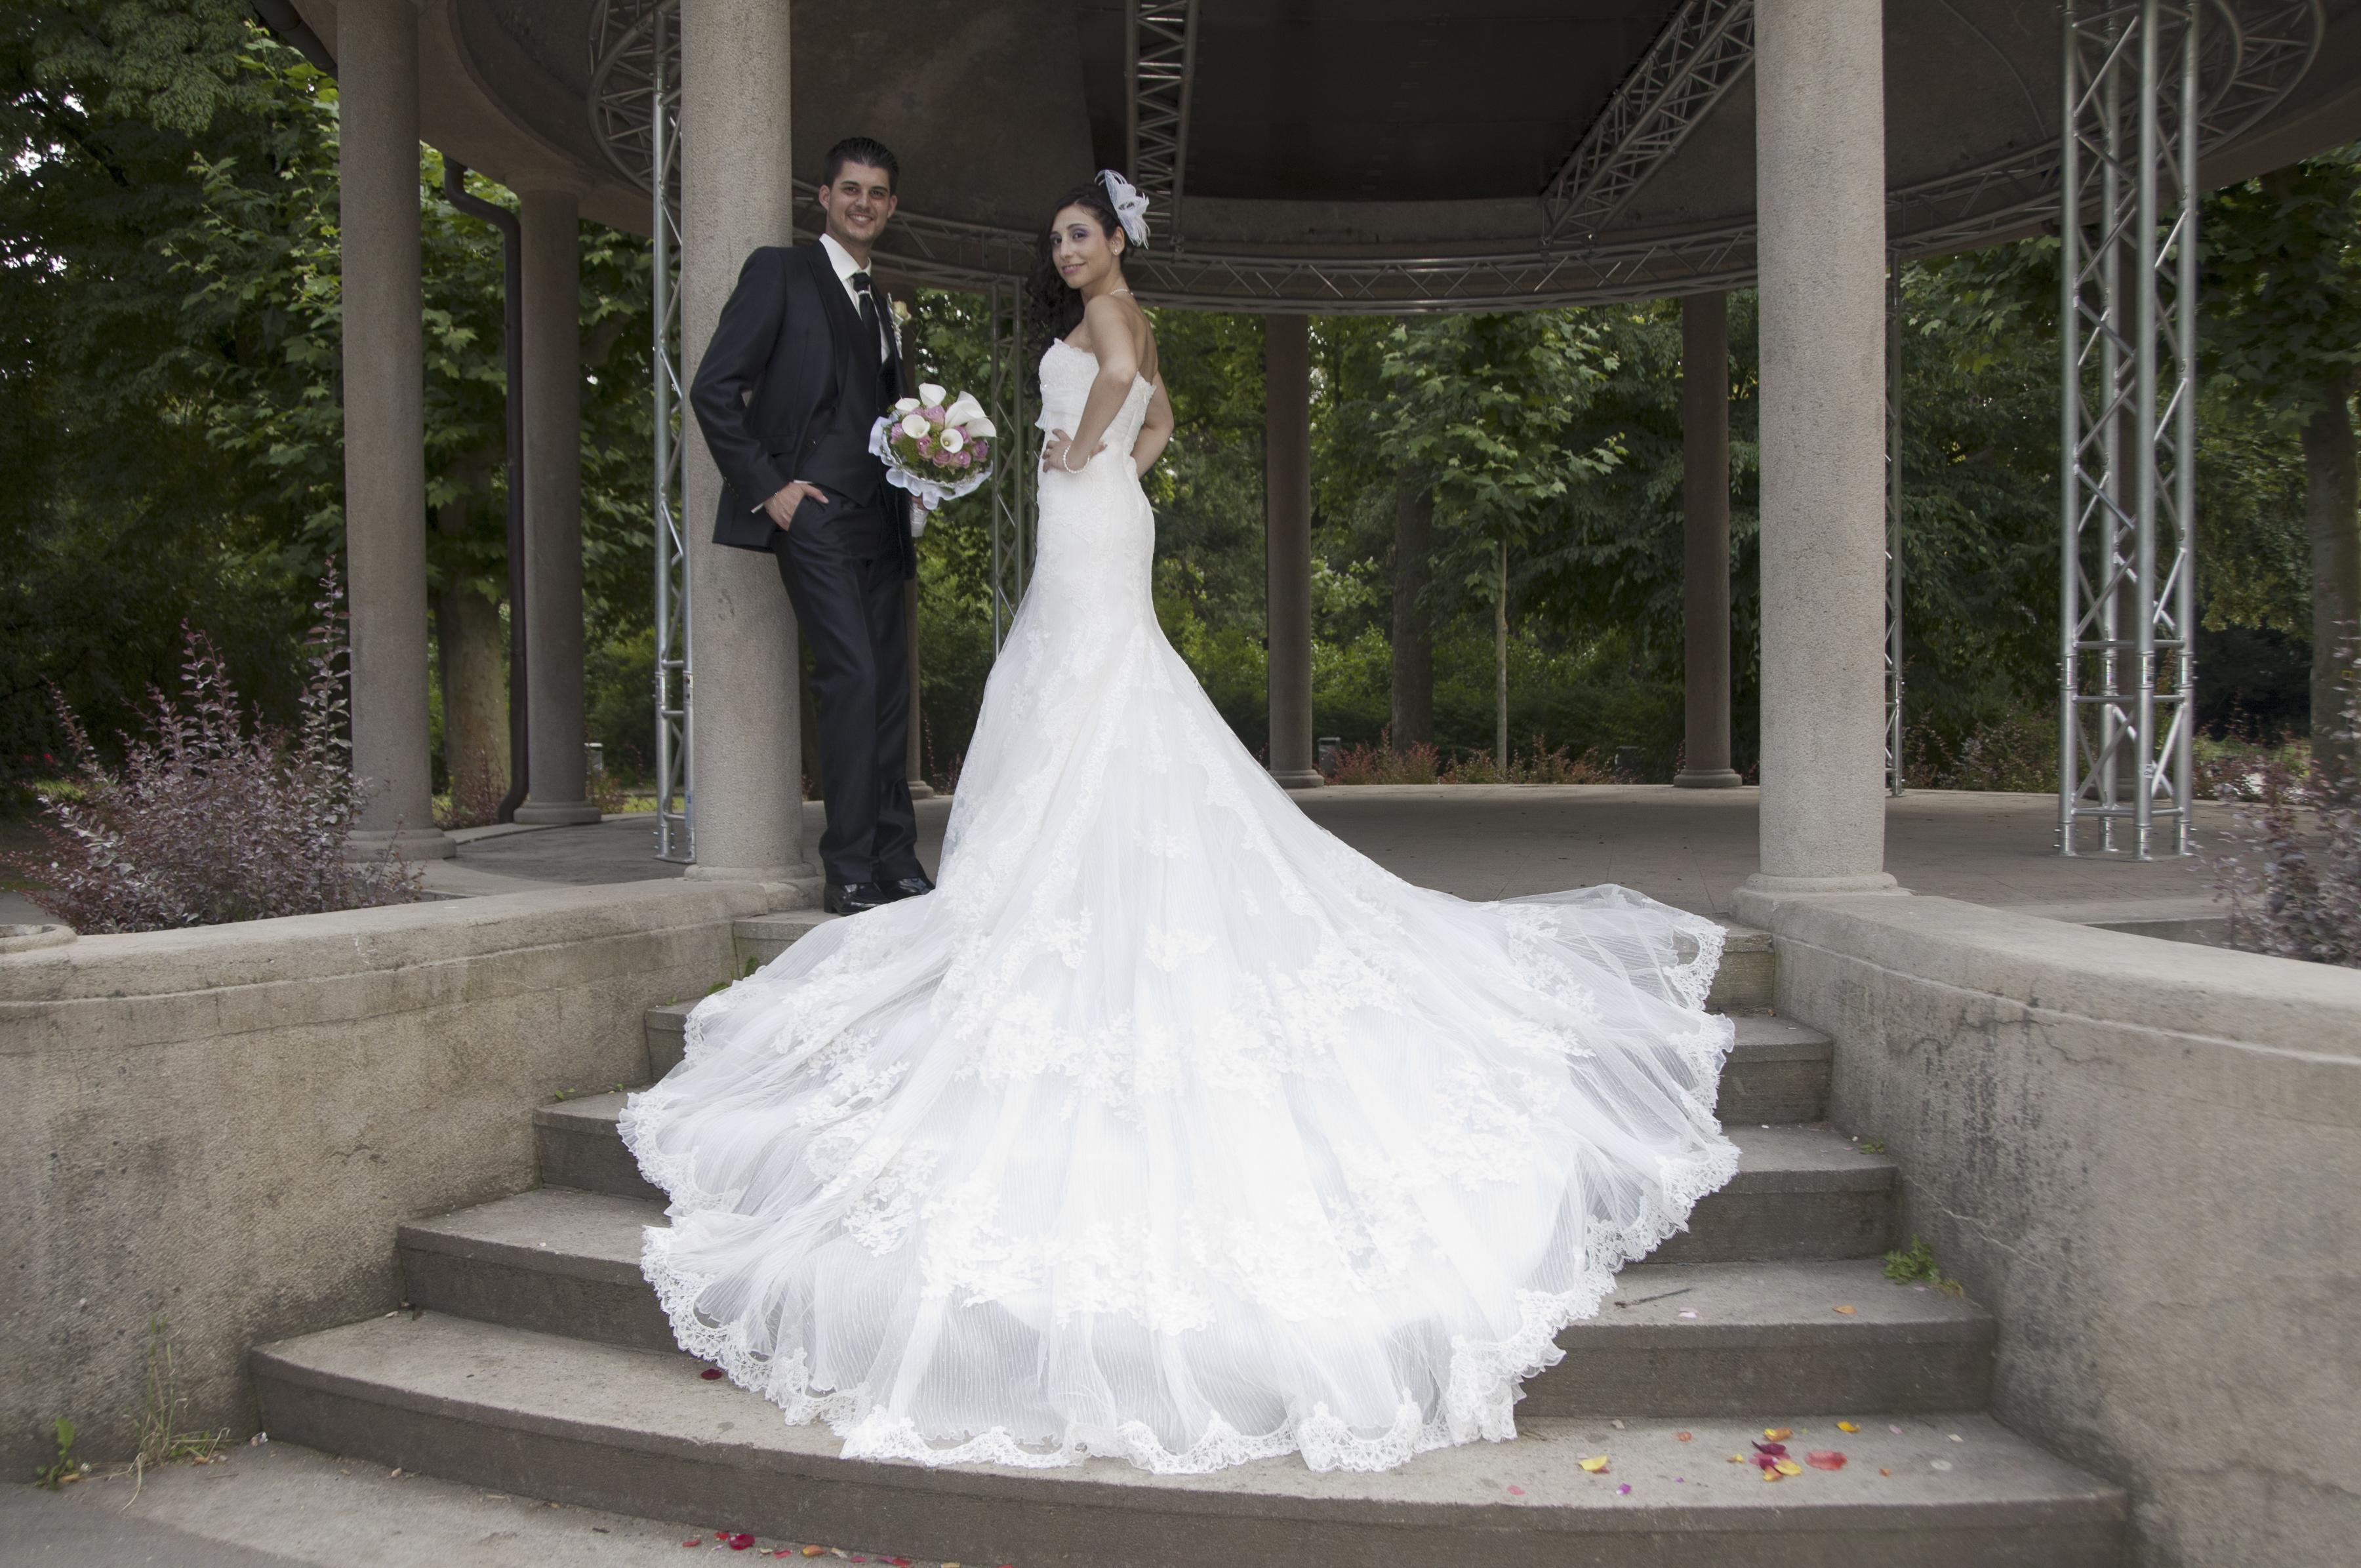 https://sleeklens.com/wp-content/uploads/2018/09/wedding-lightroom-presets-signature-bride-groom-before-4.jpg